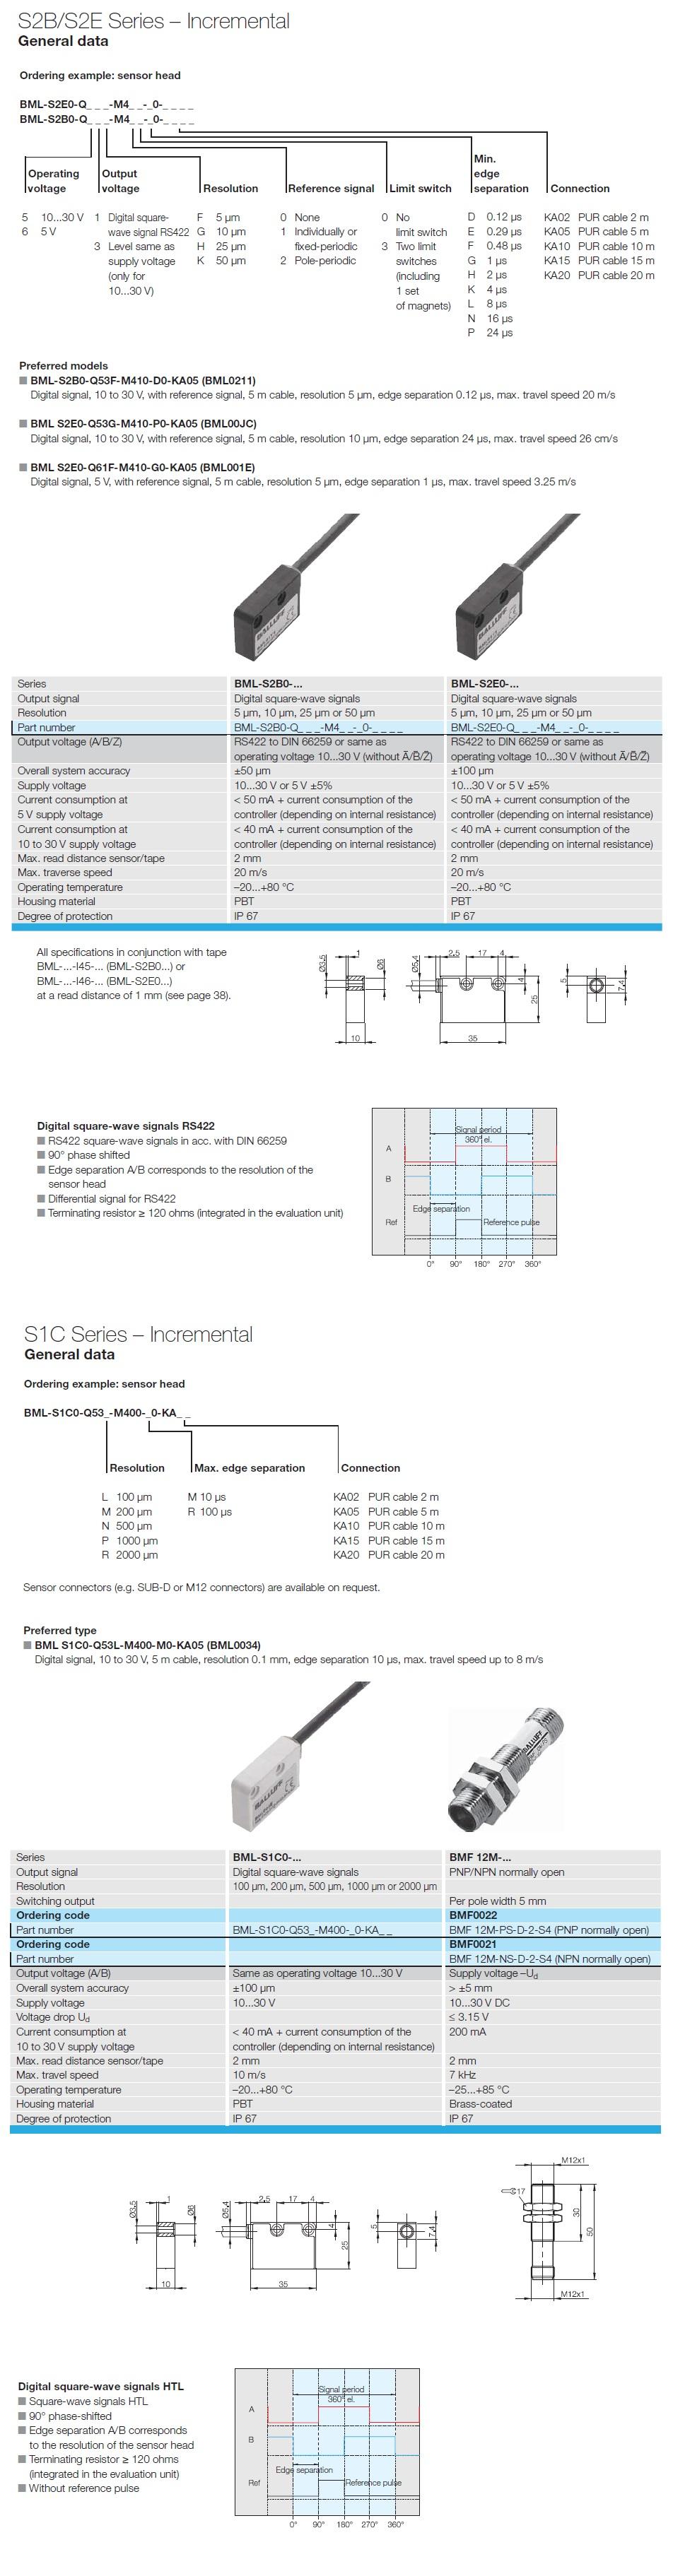 Balluff Wiring Diagram - Wiring Diagrams on